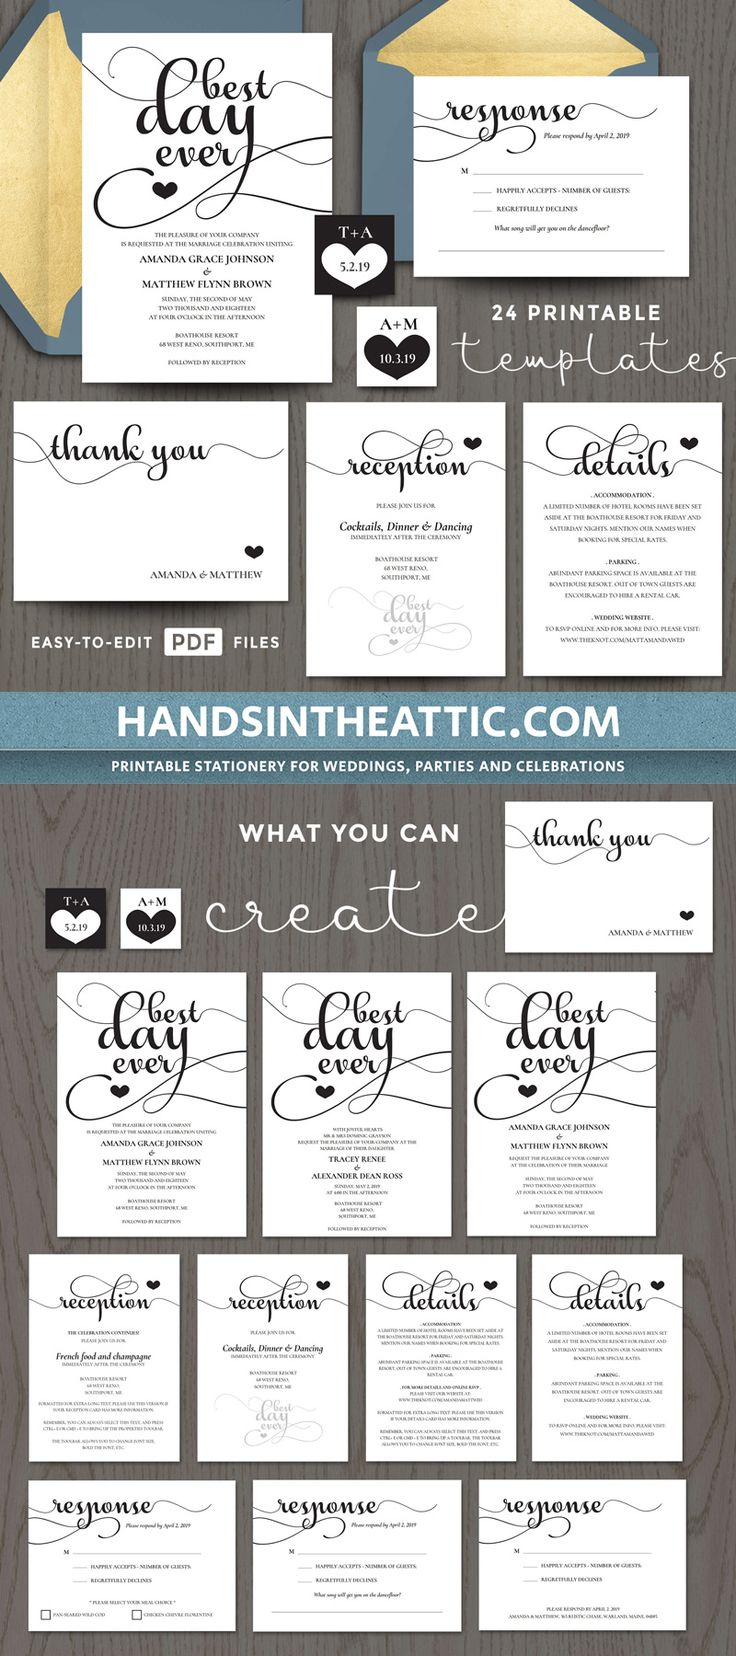 83 best Wedding Invitations images on Pinterest | My etsy shop ...